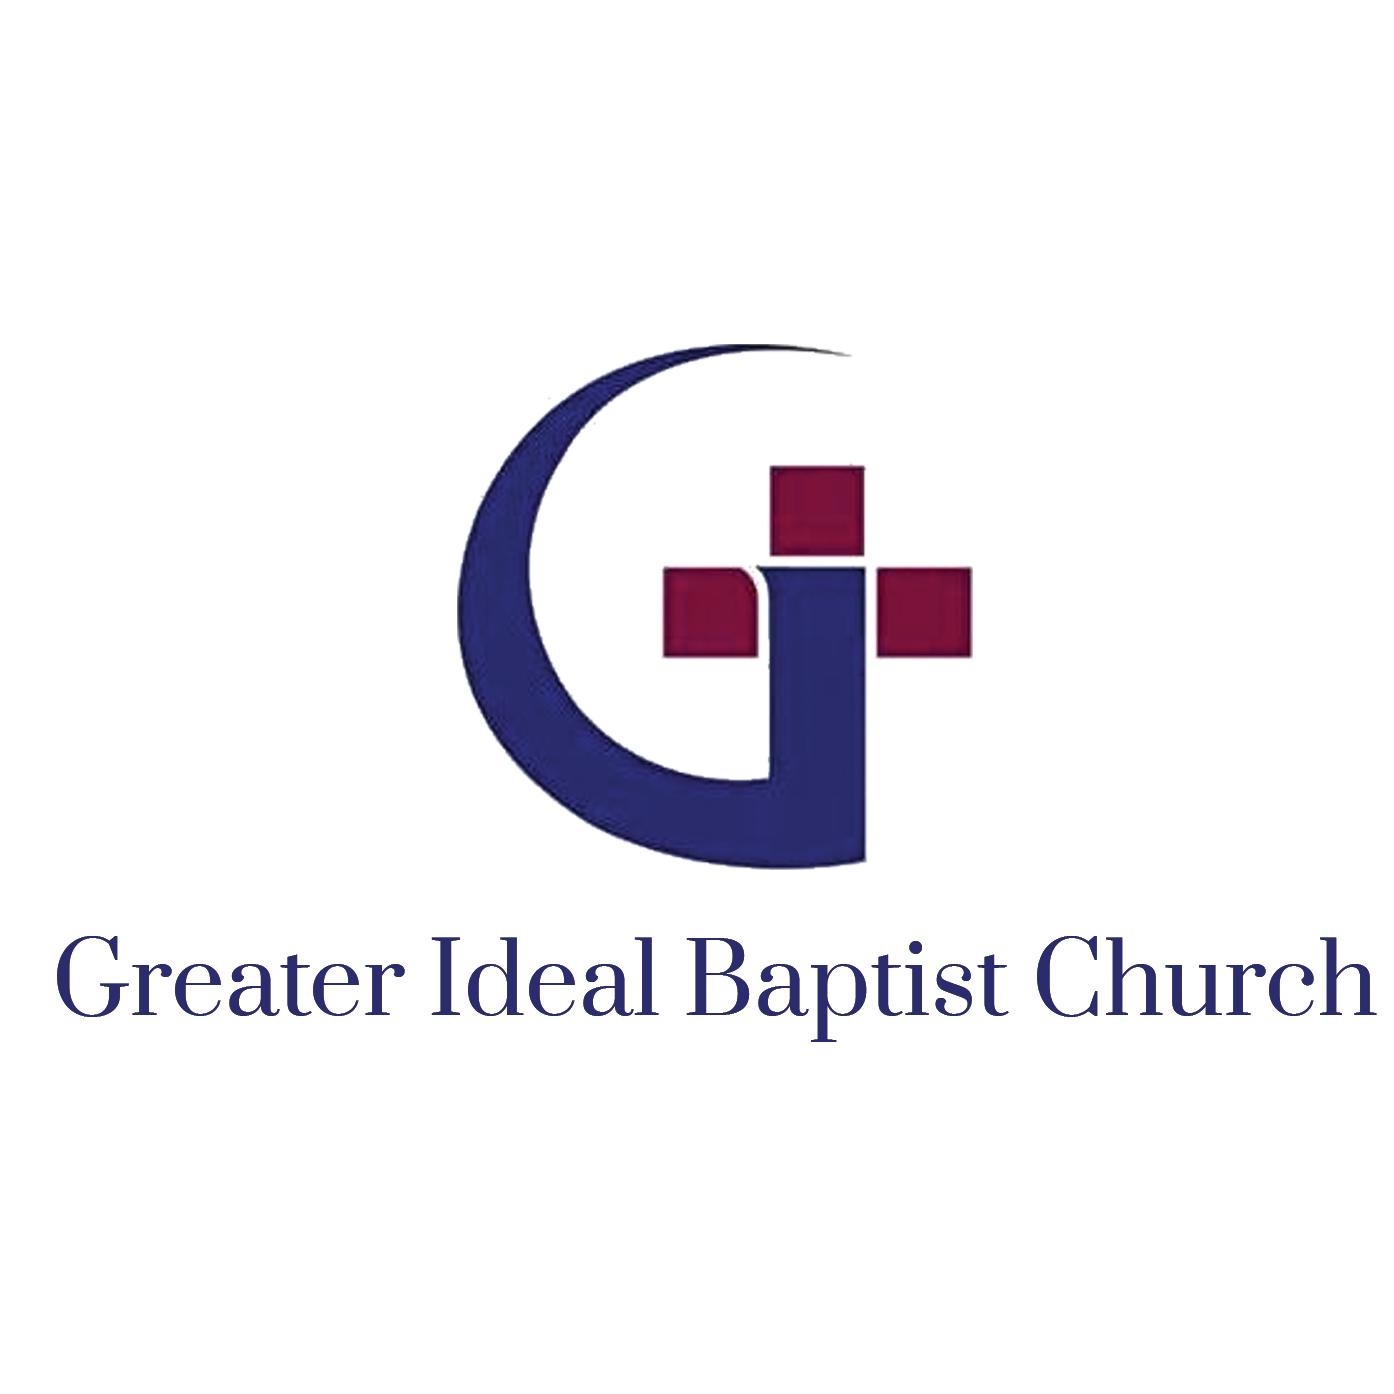 Greater Ideal Baptist Church